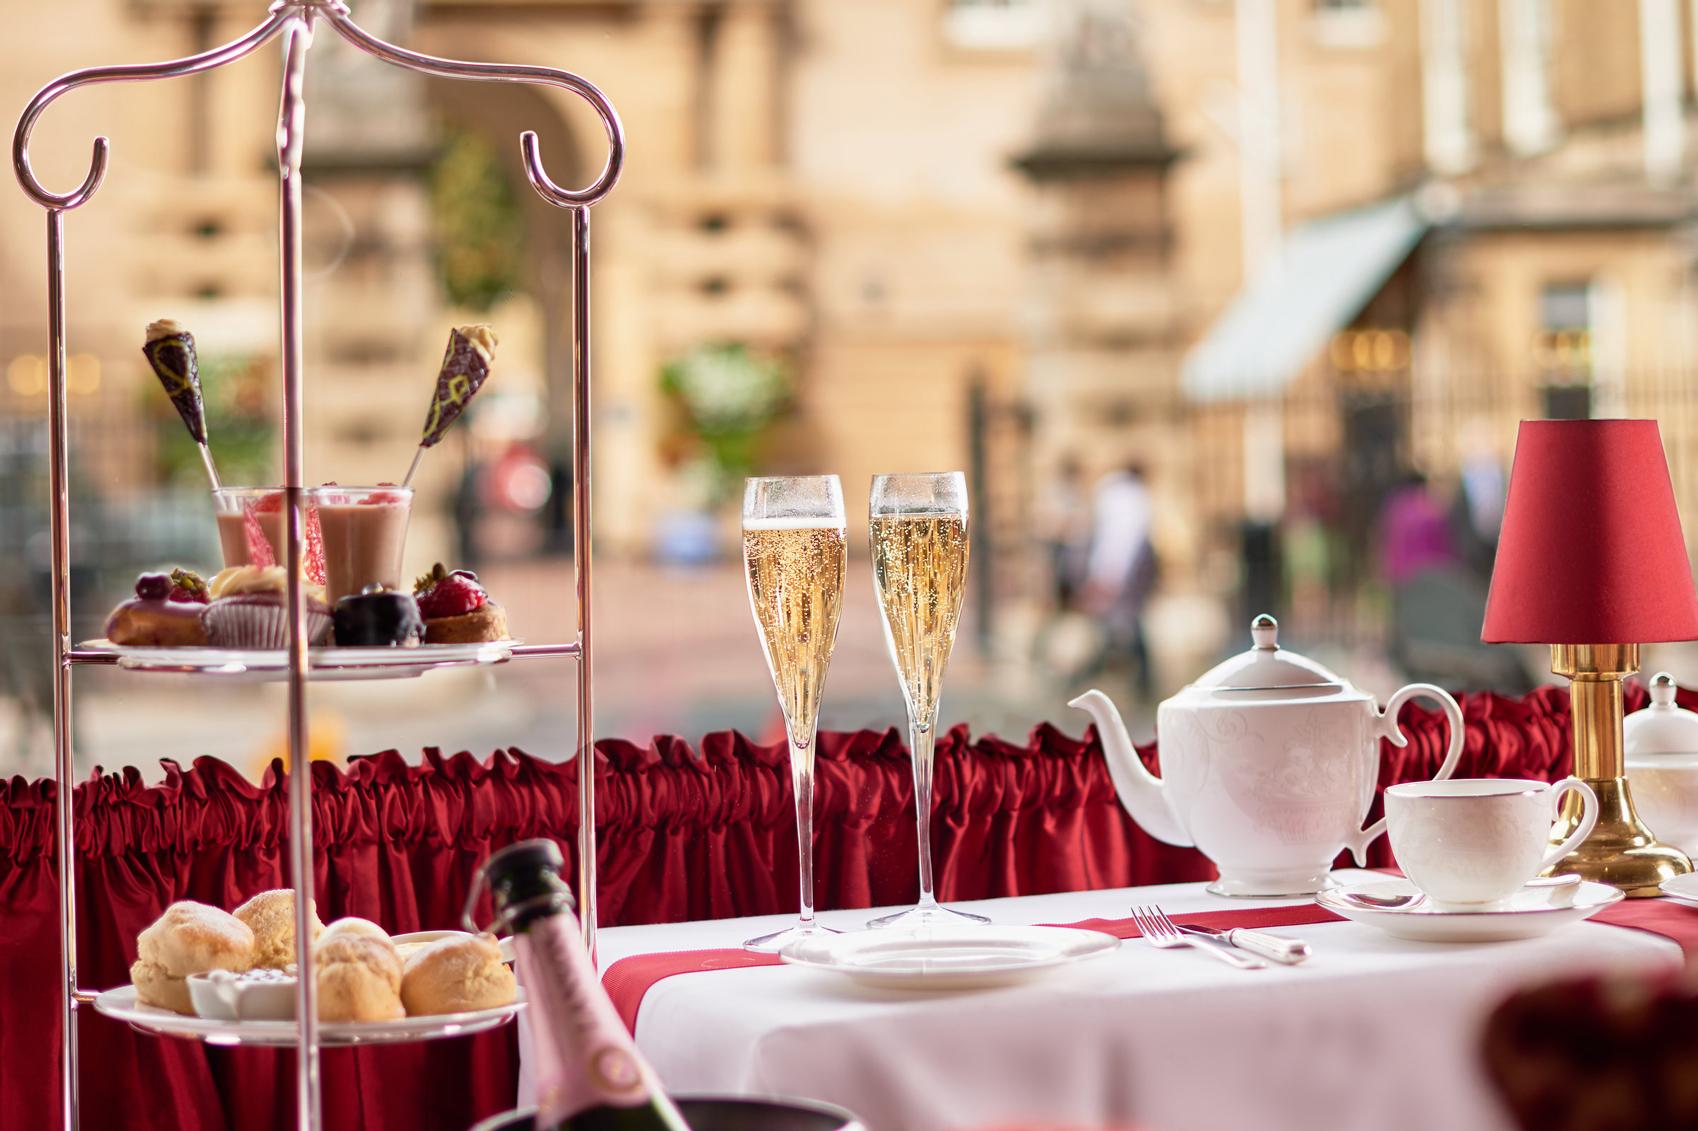 afternoon tea UK RB_PalaceLounge_002